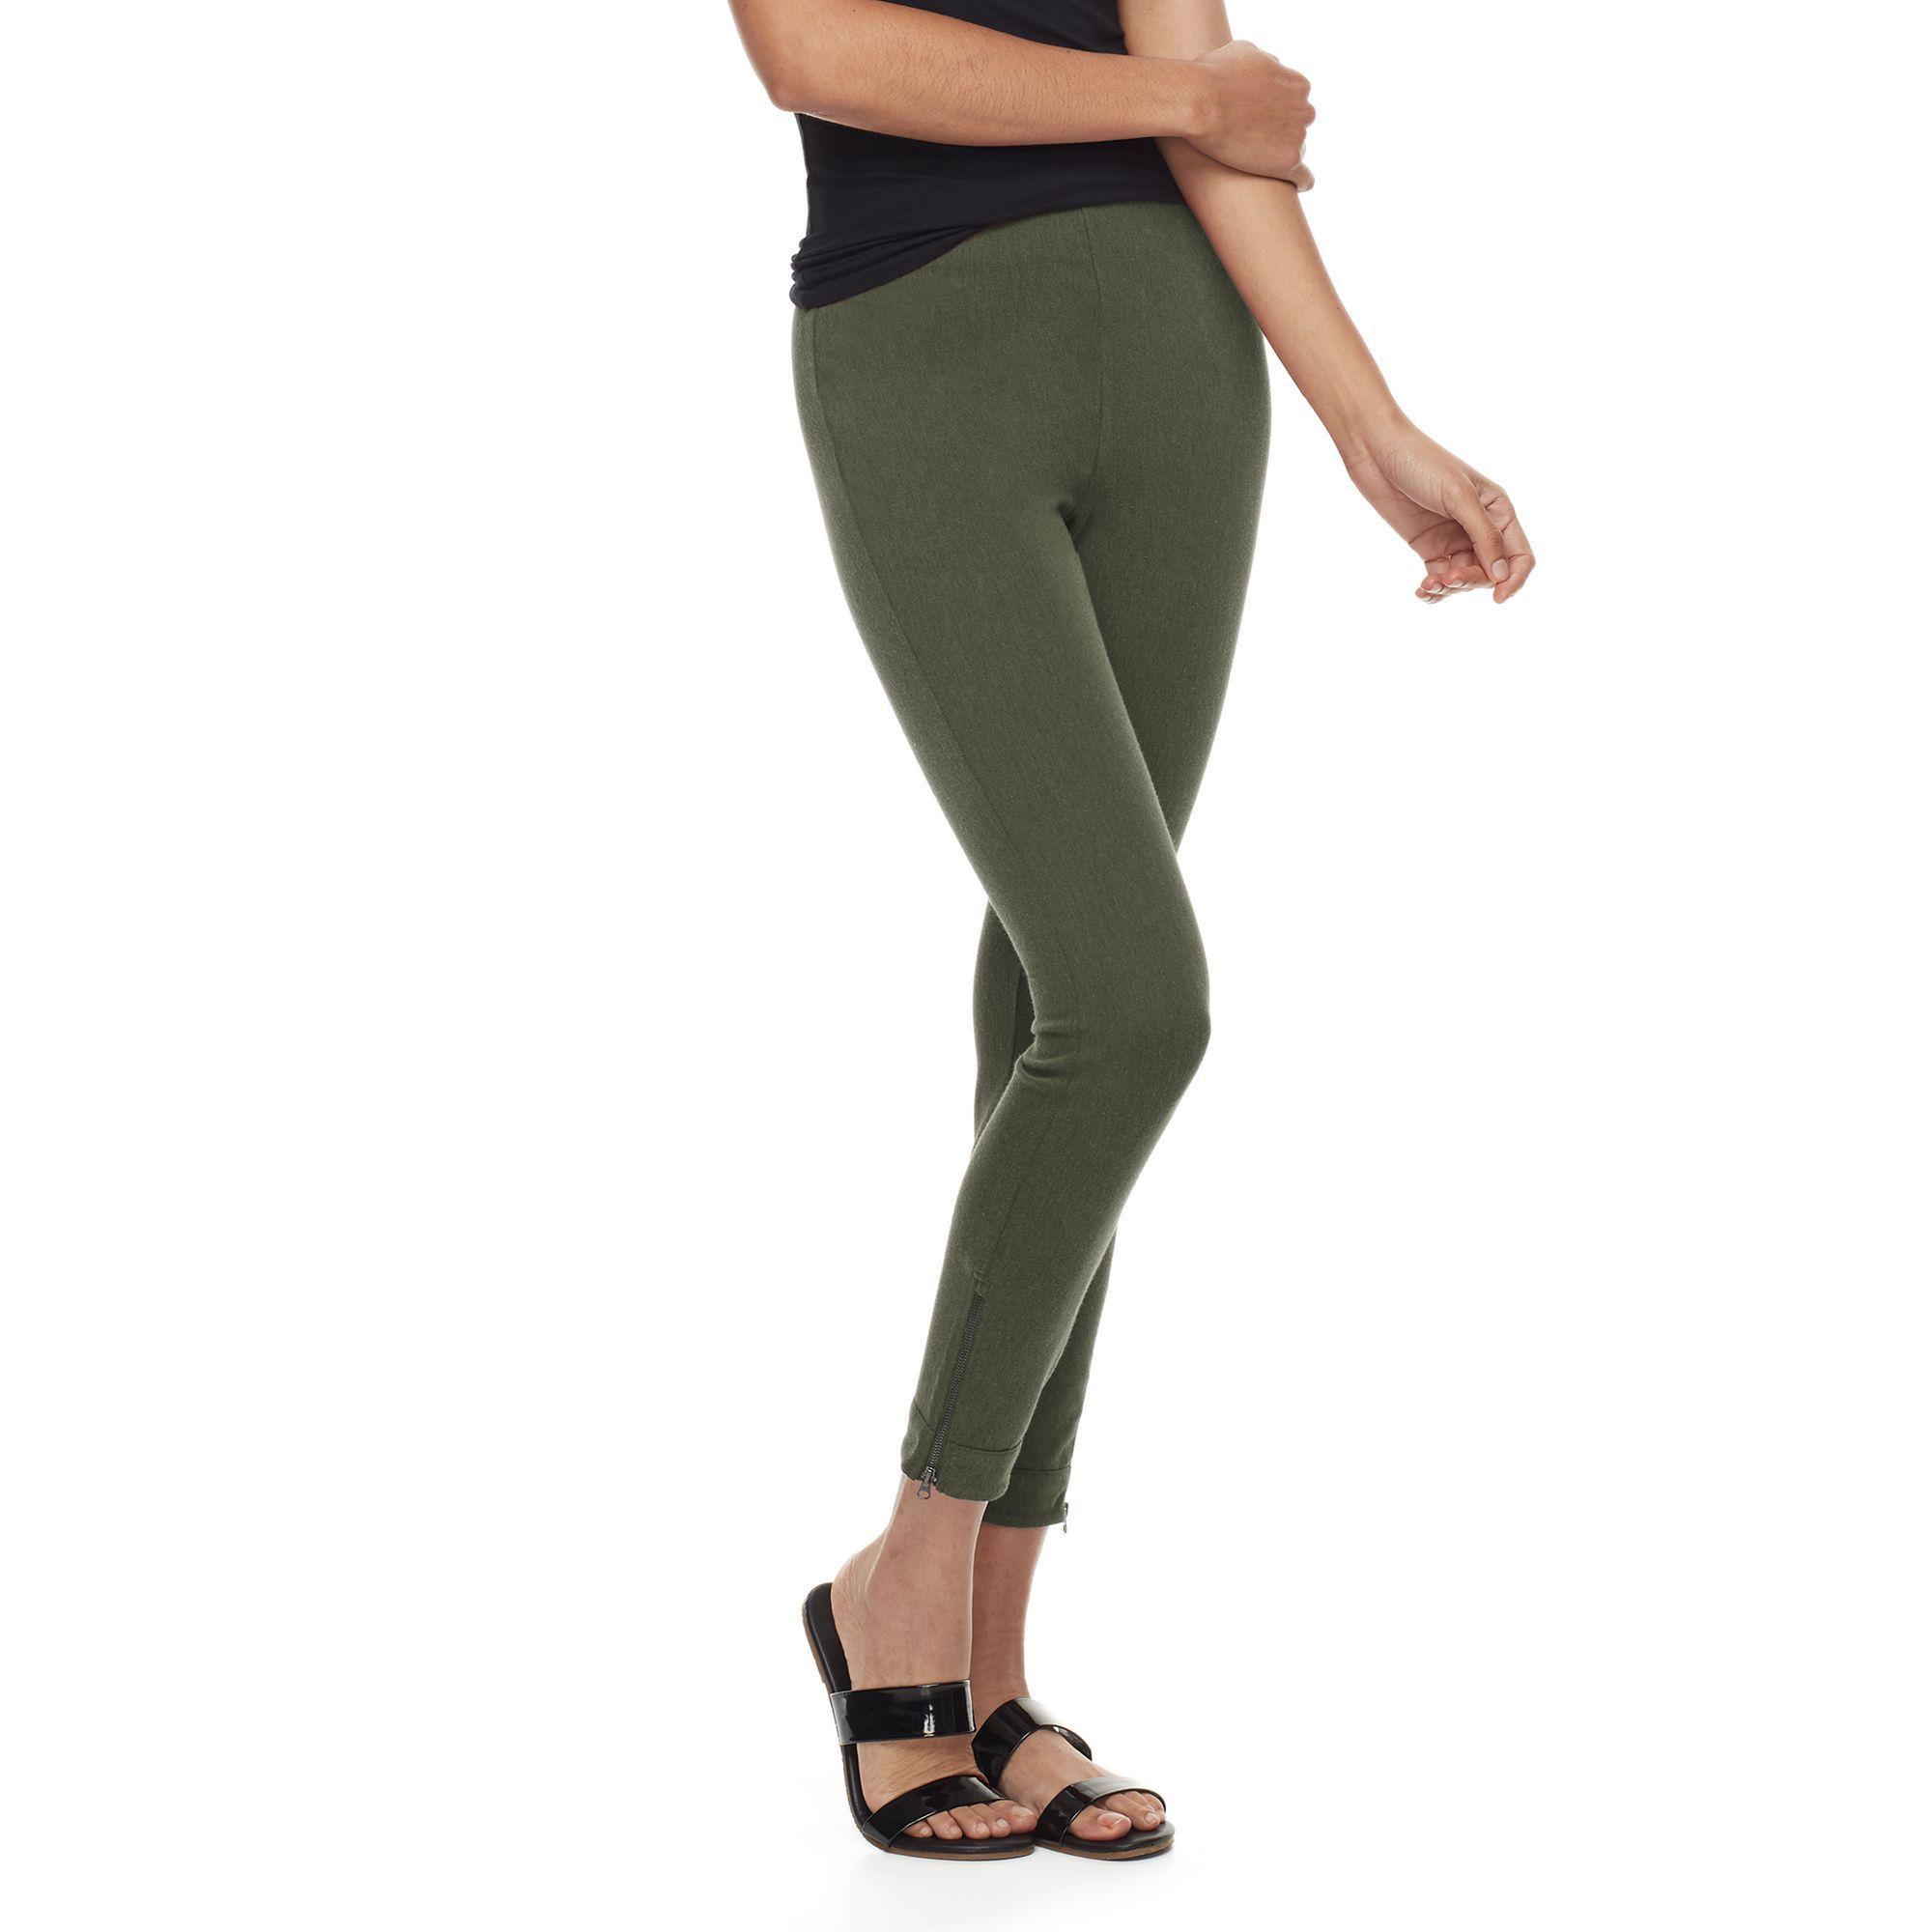 0707d93906eeb Utopia by HUE Felted Denim Skimmer Leggings, Women's, Size: Medium, Green  Oth